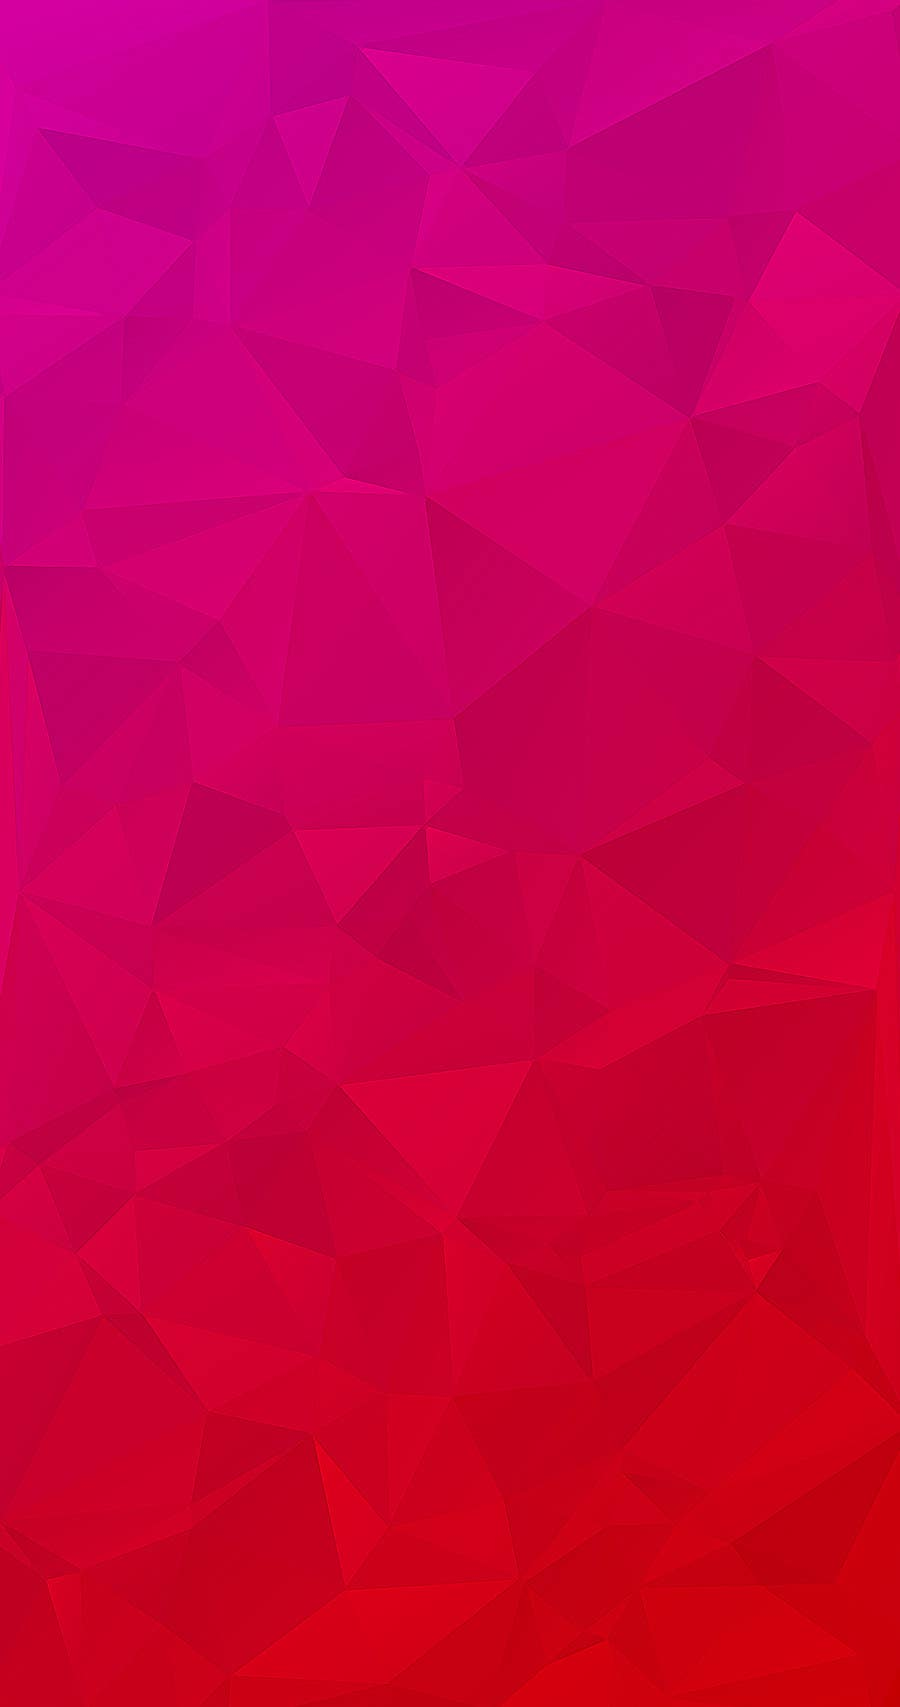 Konkurrenceindlæg #                                        22                                      for                                         Background image: graphic/geometric design needed